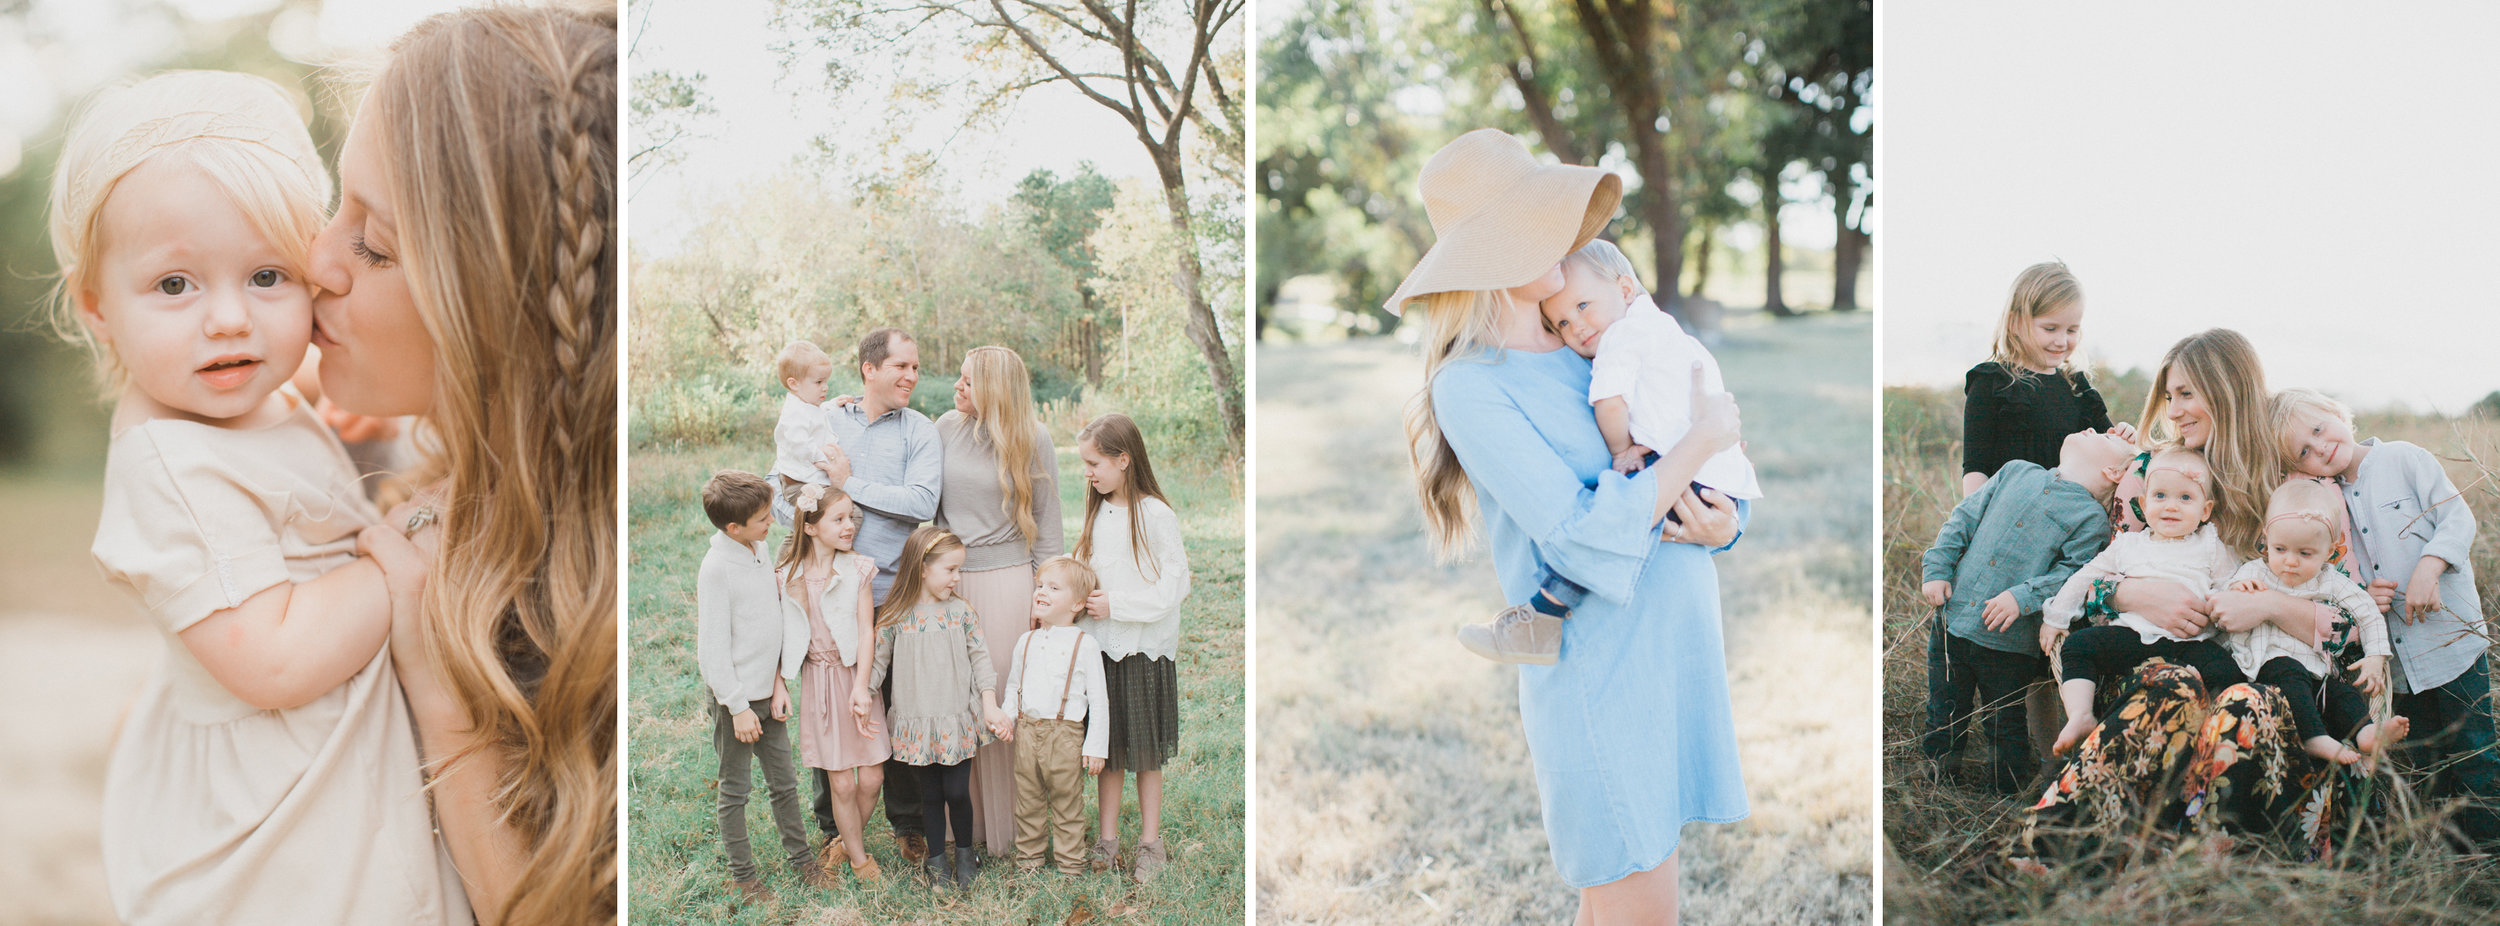 Motherhood blog picture.jpg